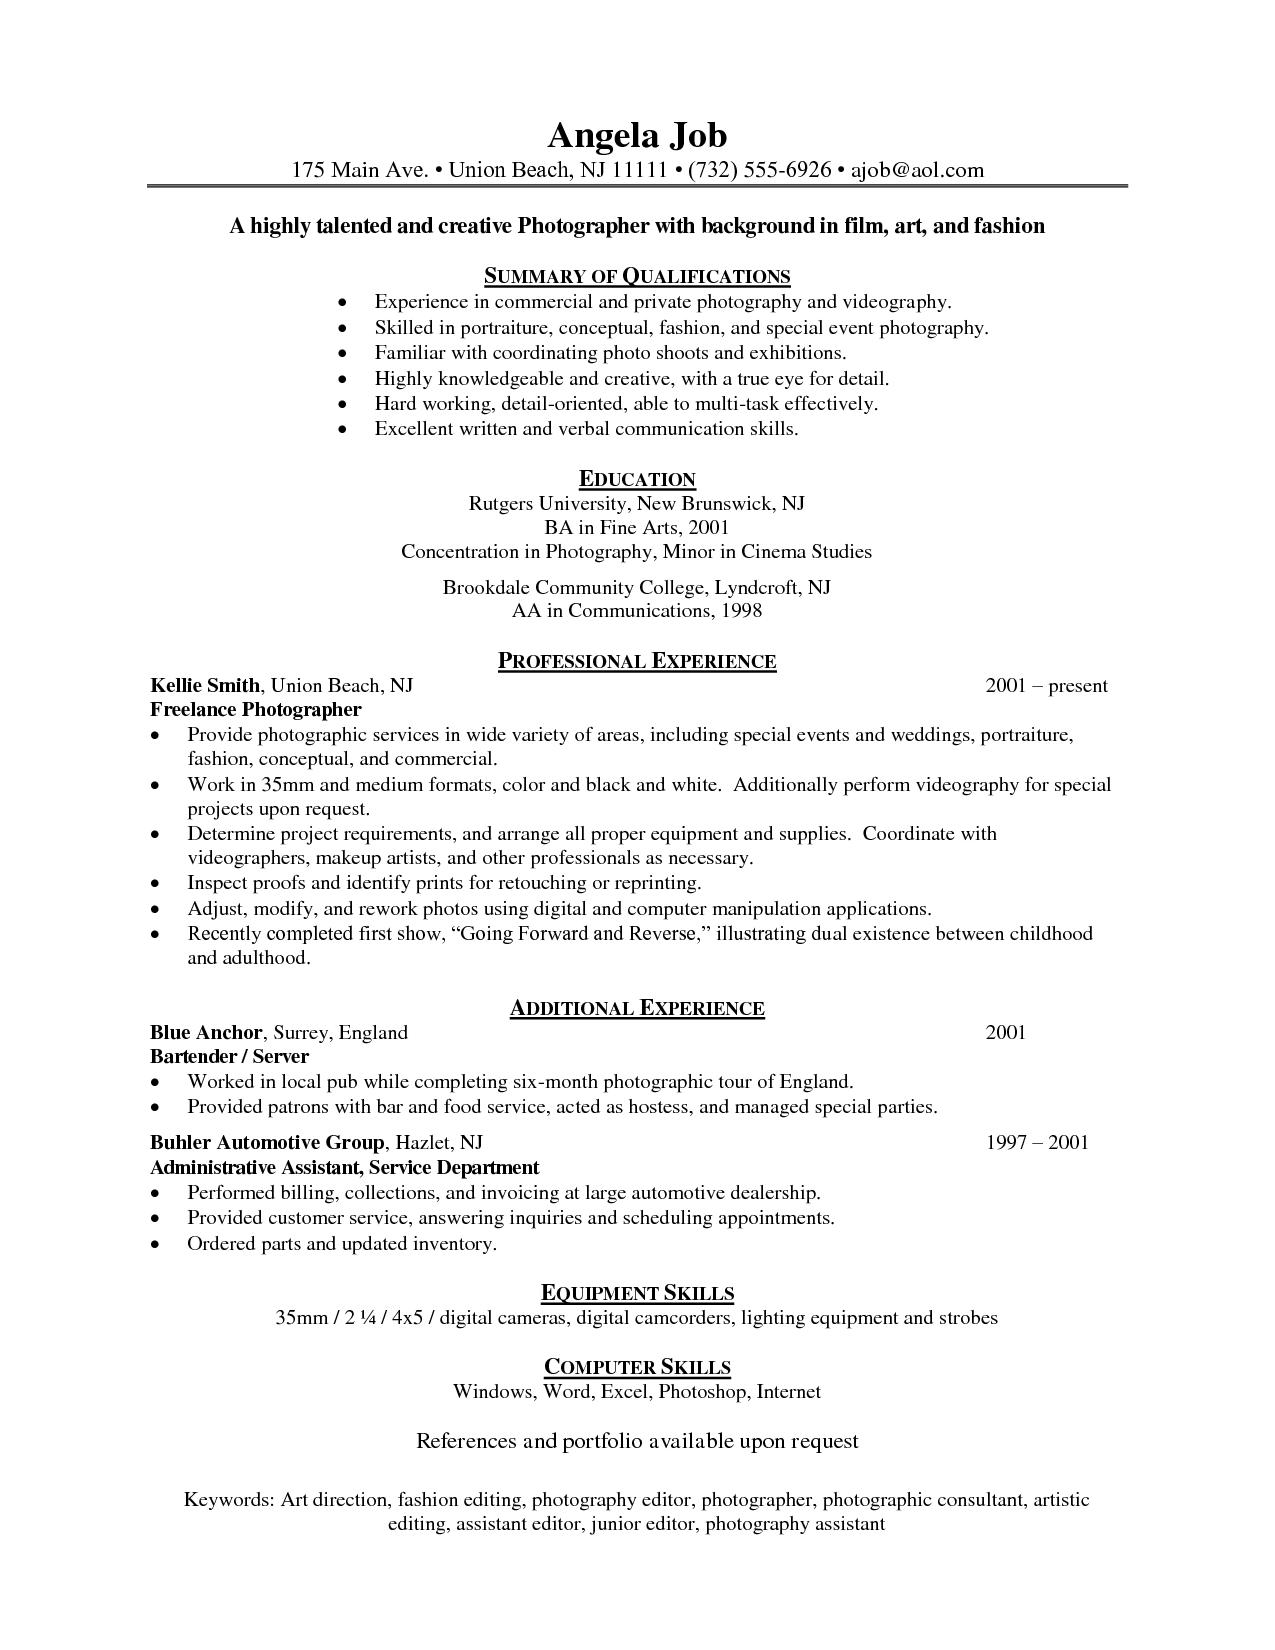 sample resume objectives for photographer